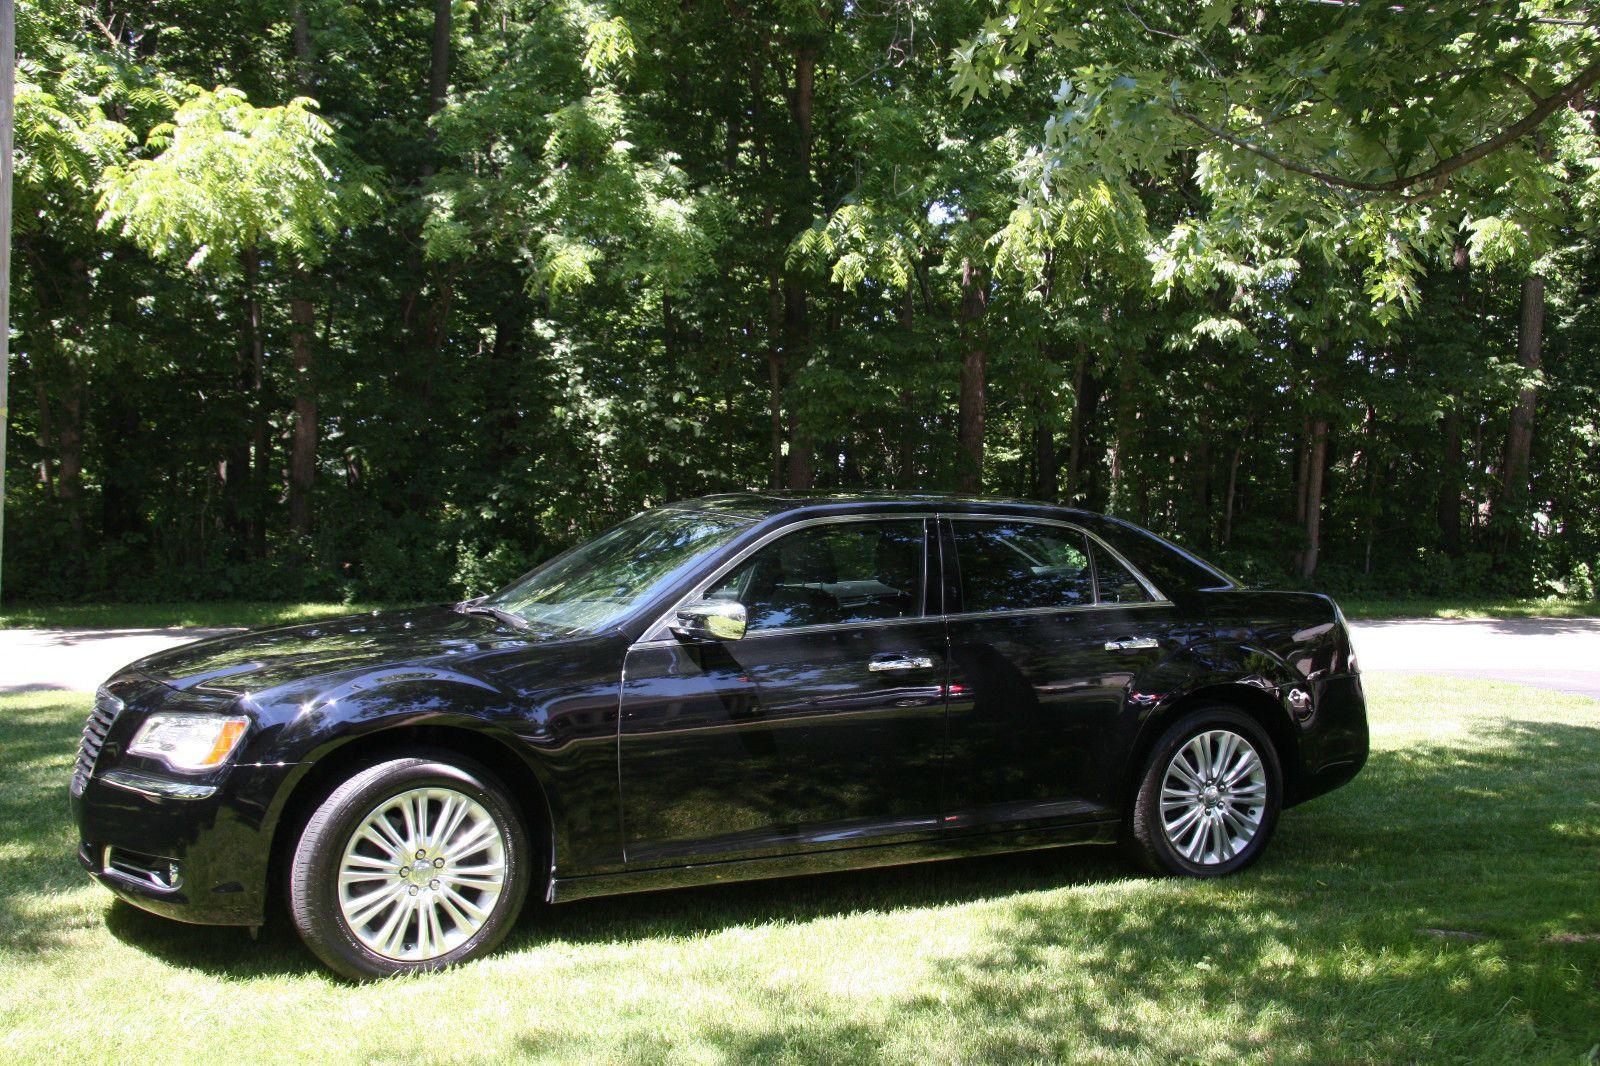 Car Brand Auctioned Chrysler 300 C Sedan 4 Door 2013 Car Model